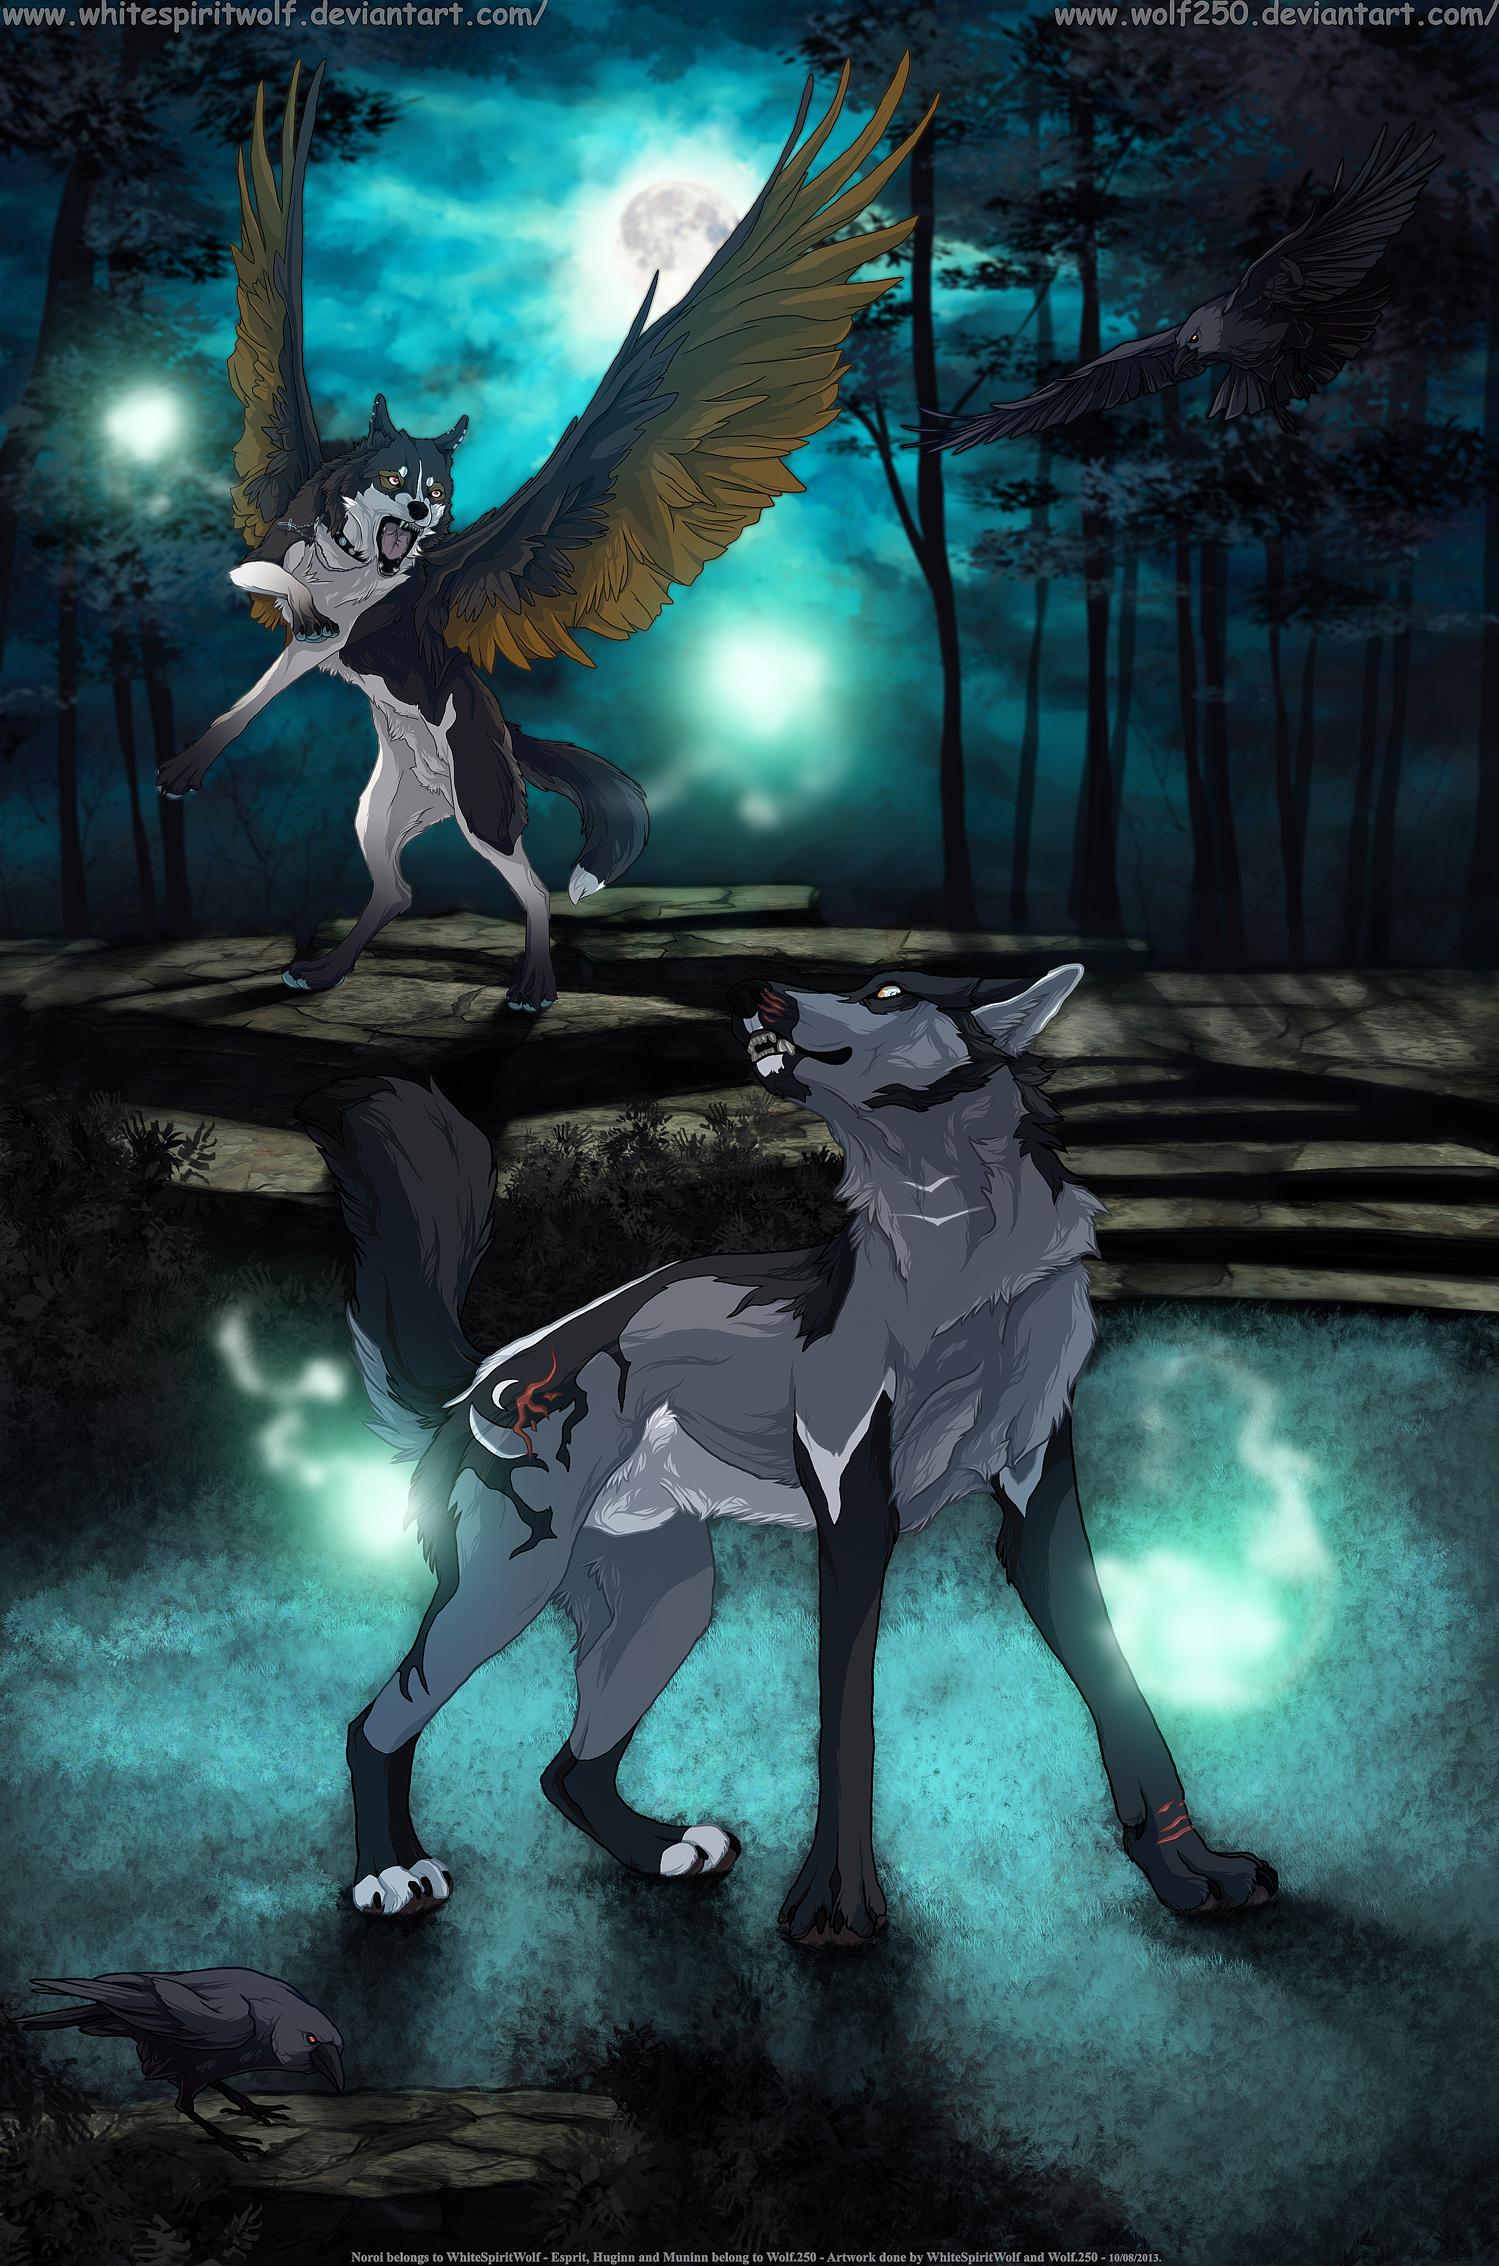 .: Nightmare Graveyard :. Collaboration by WhiteSpiritWolf